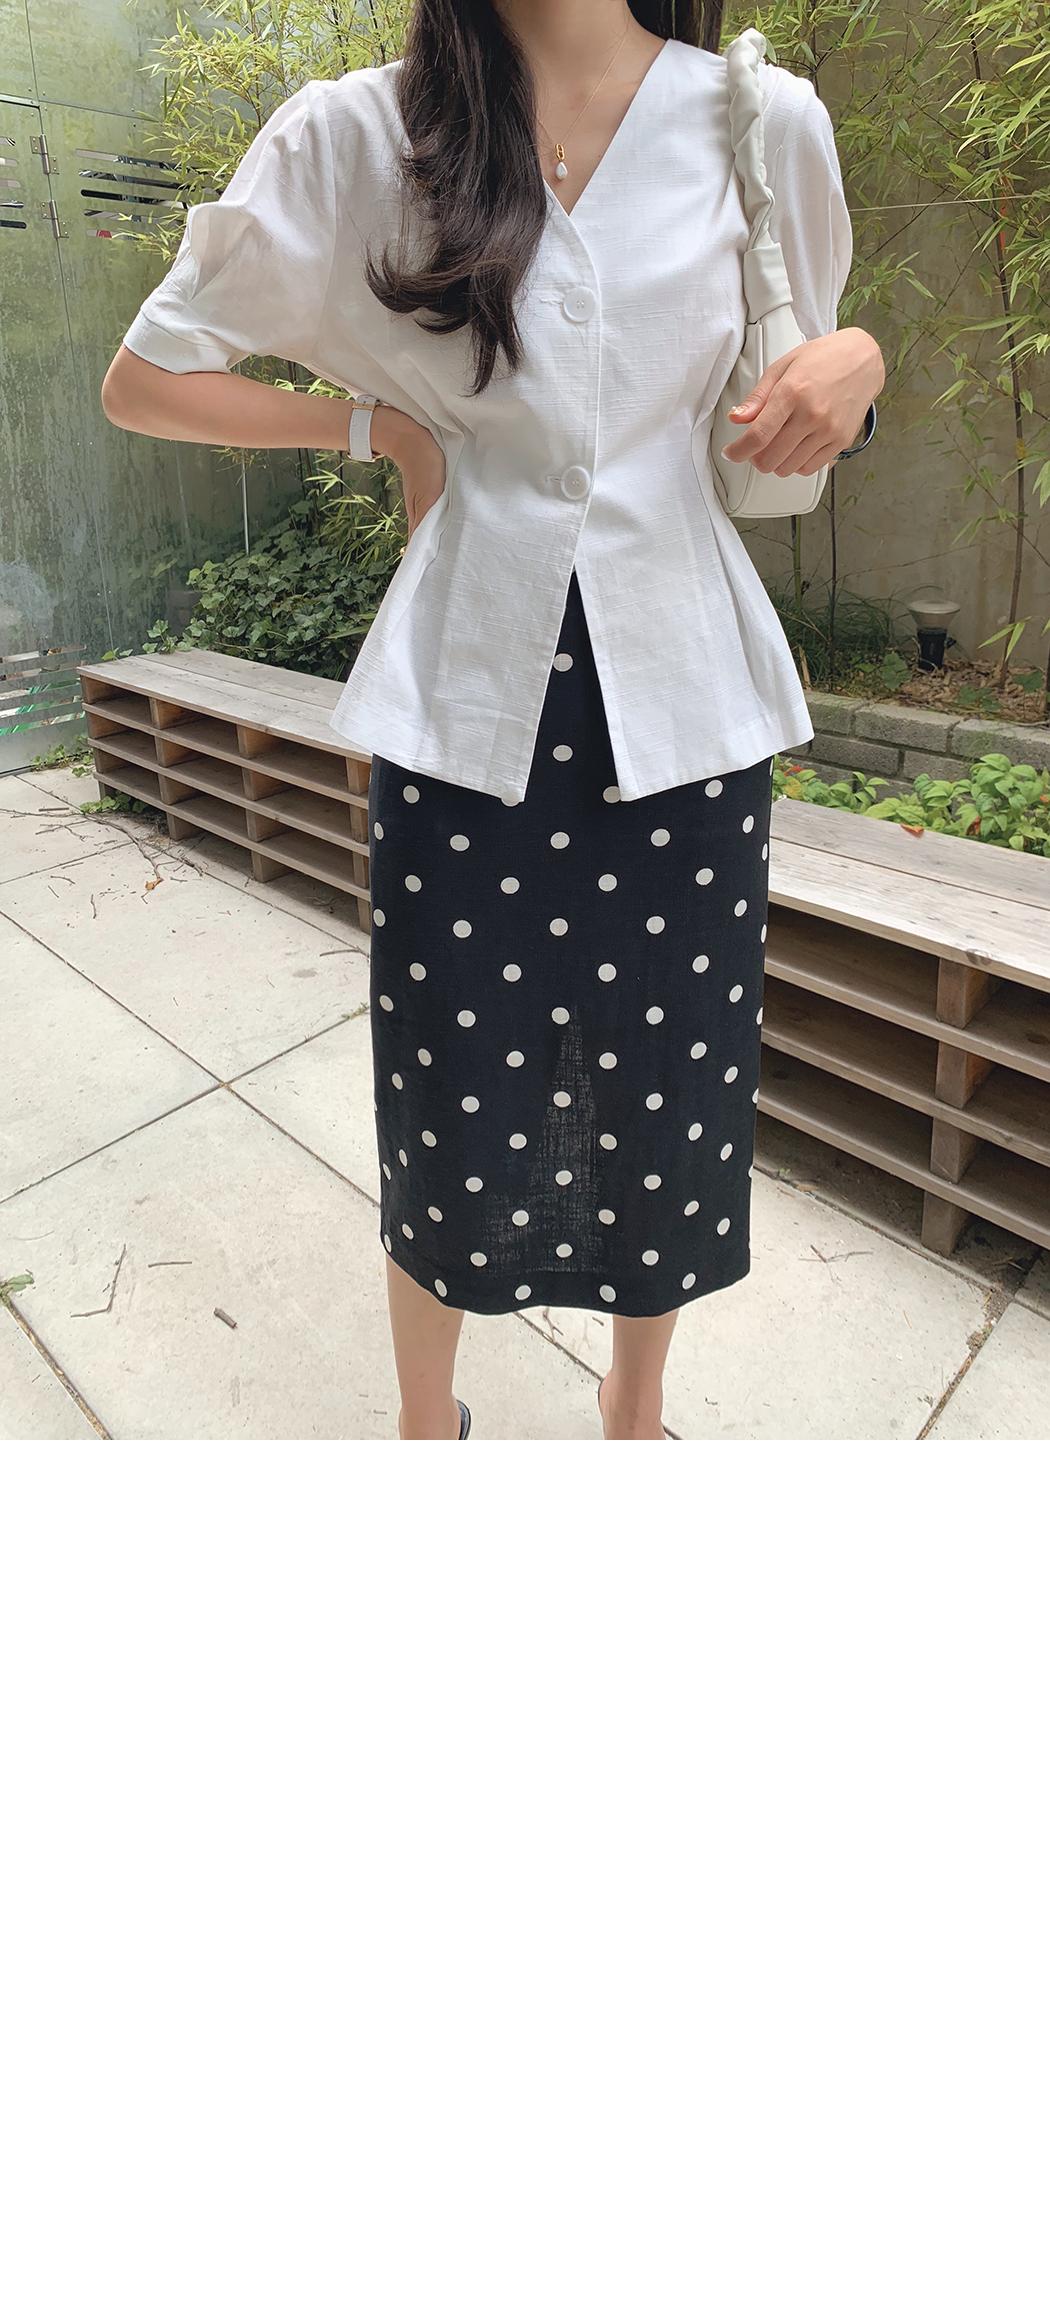 Polka-dot linen pencil skirt